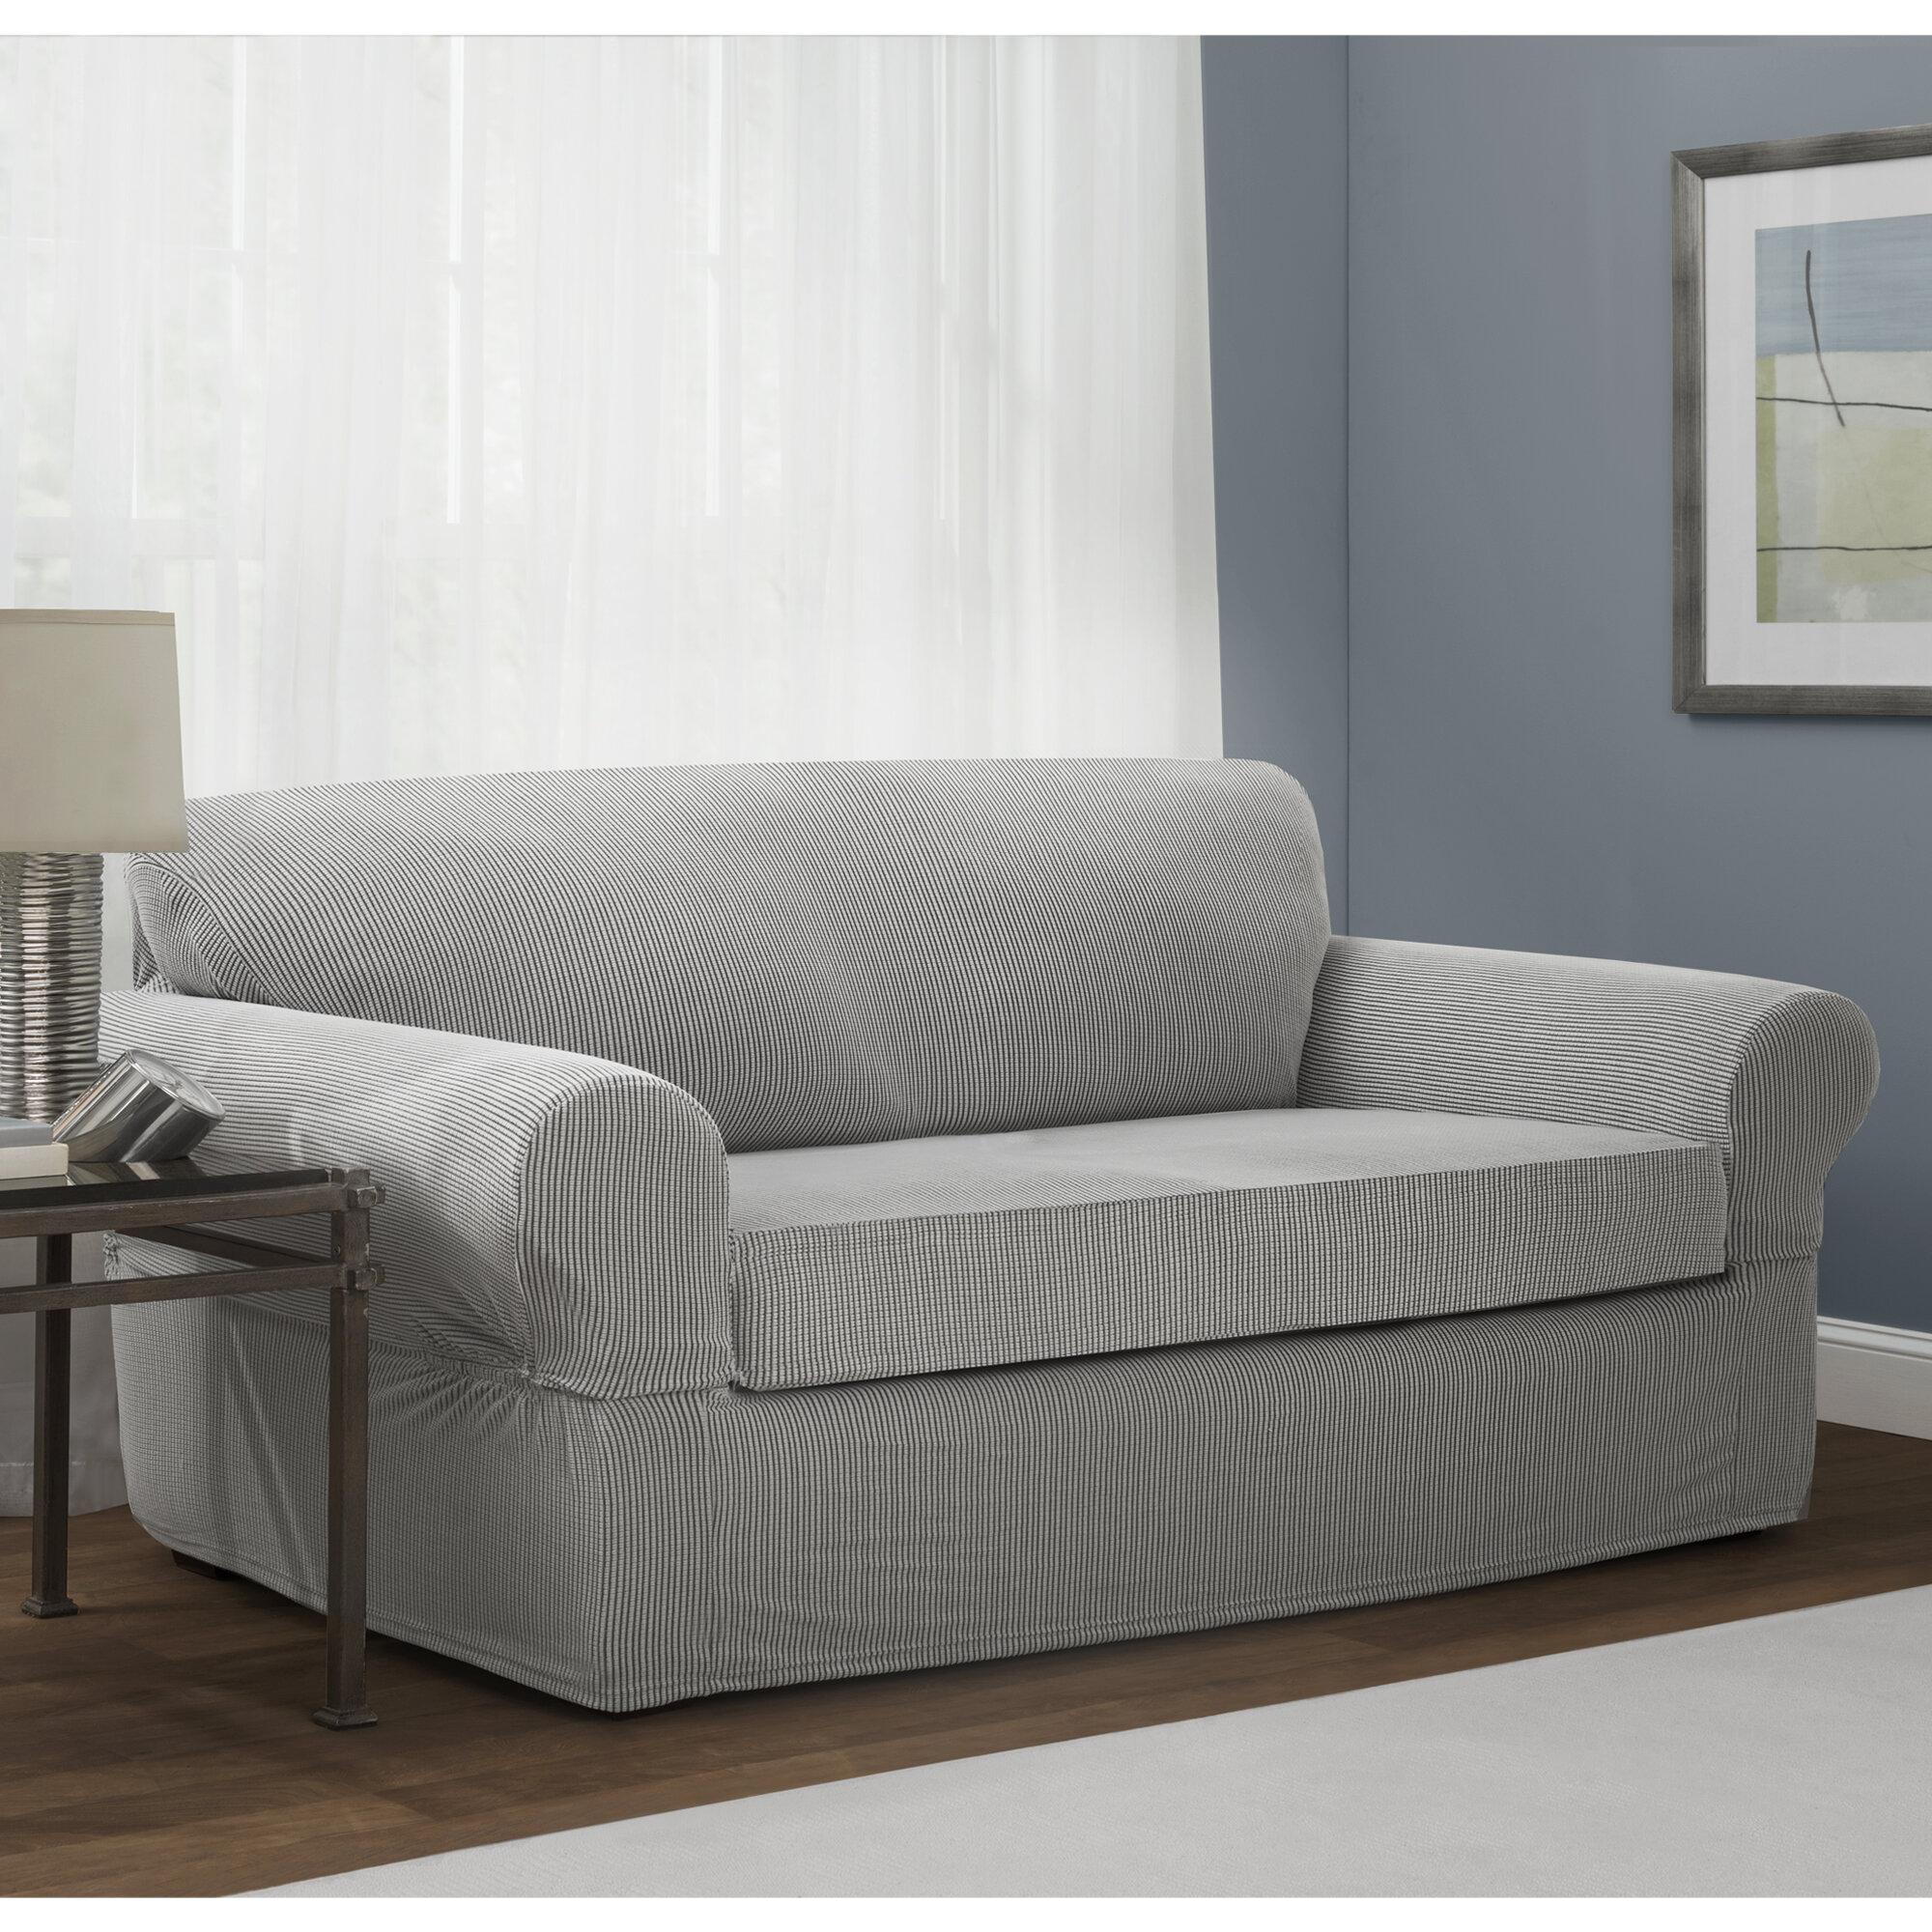 Red Barrel Studio Box Cushion Sofa Slipcover & Reviews | Wayfair